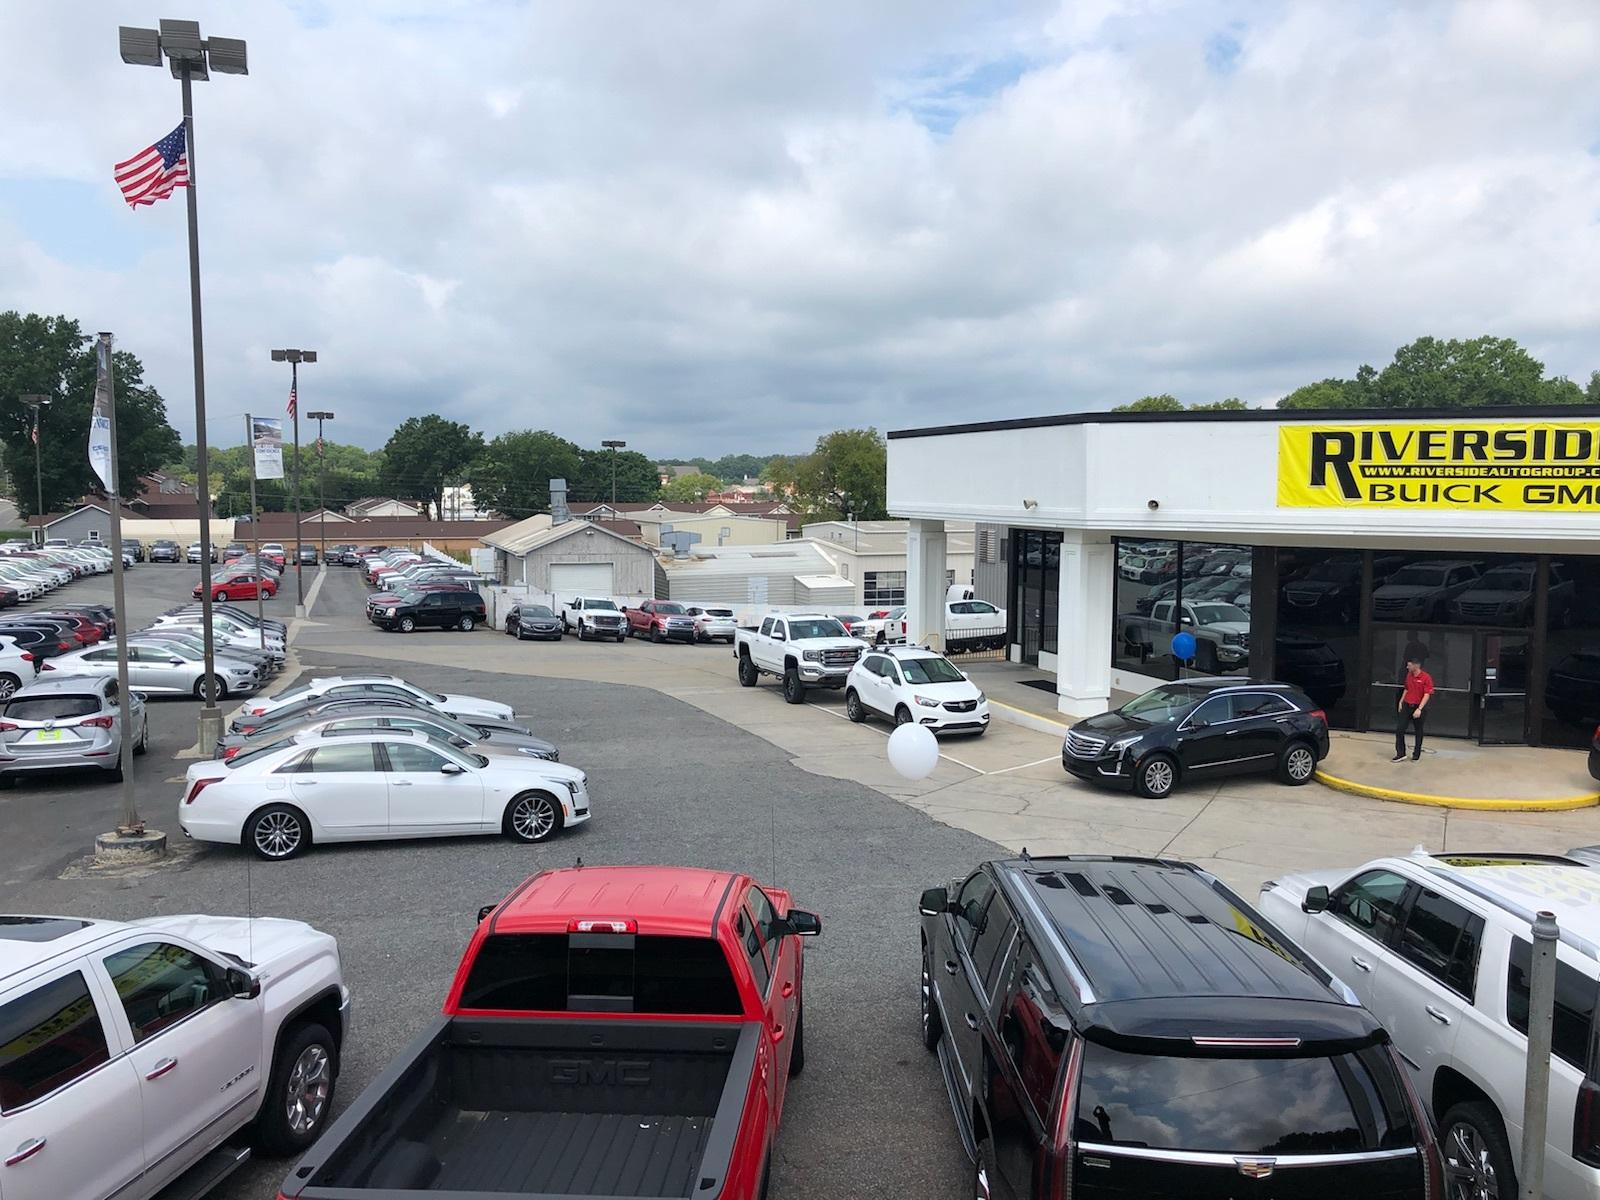 Riverside Buick GMC image 4